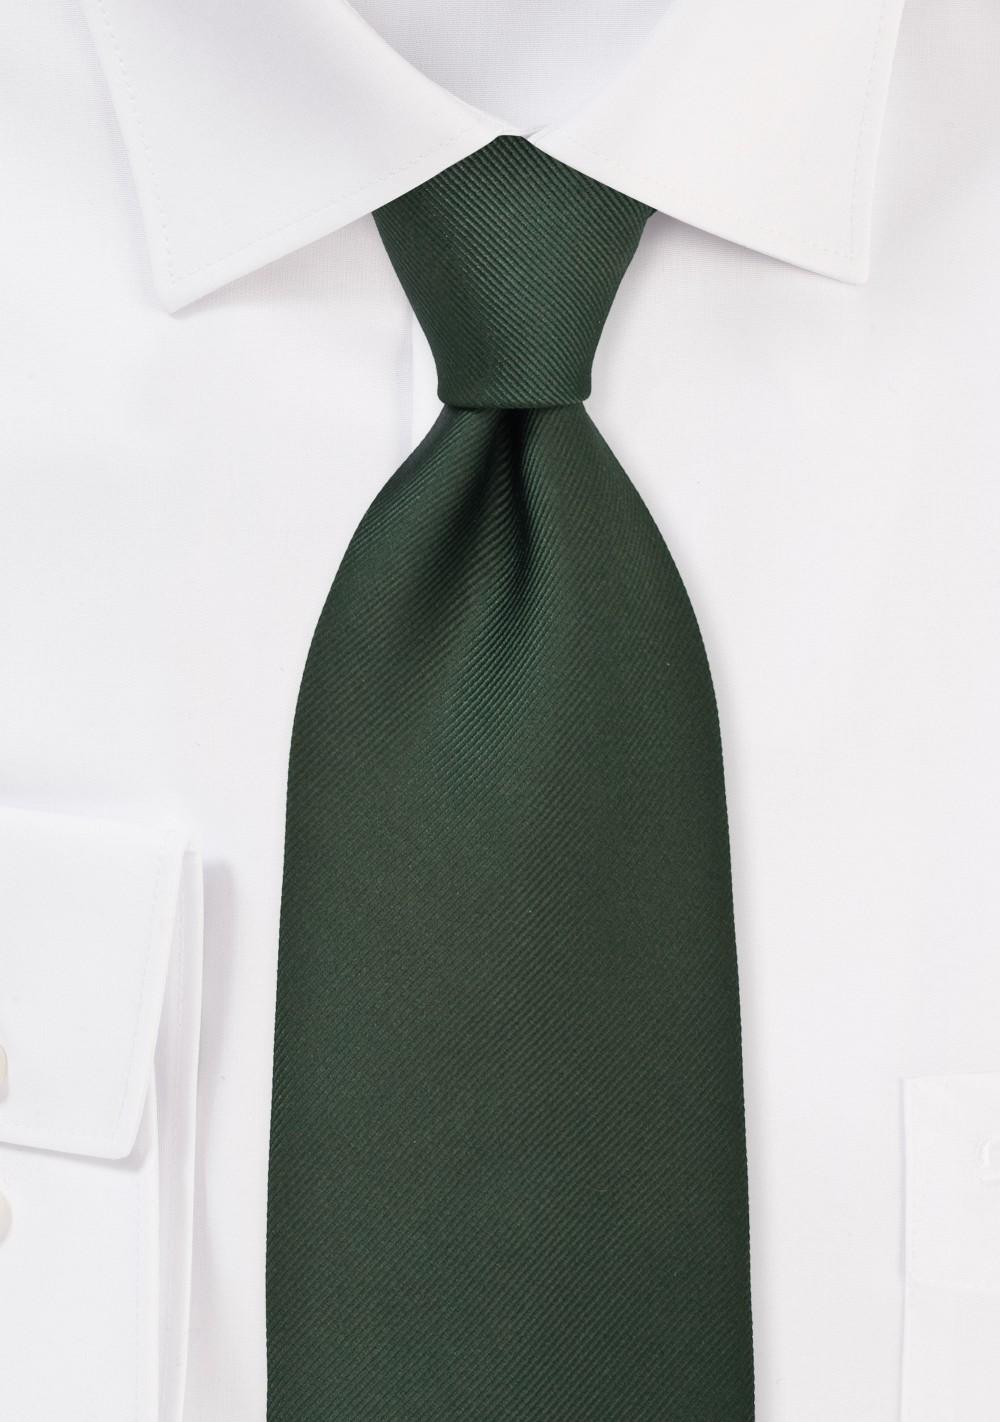 XL Mens Tie in Hunter Green